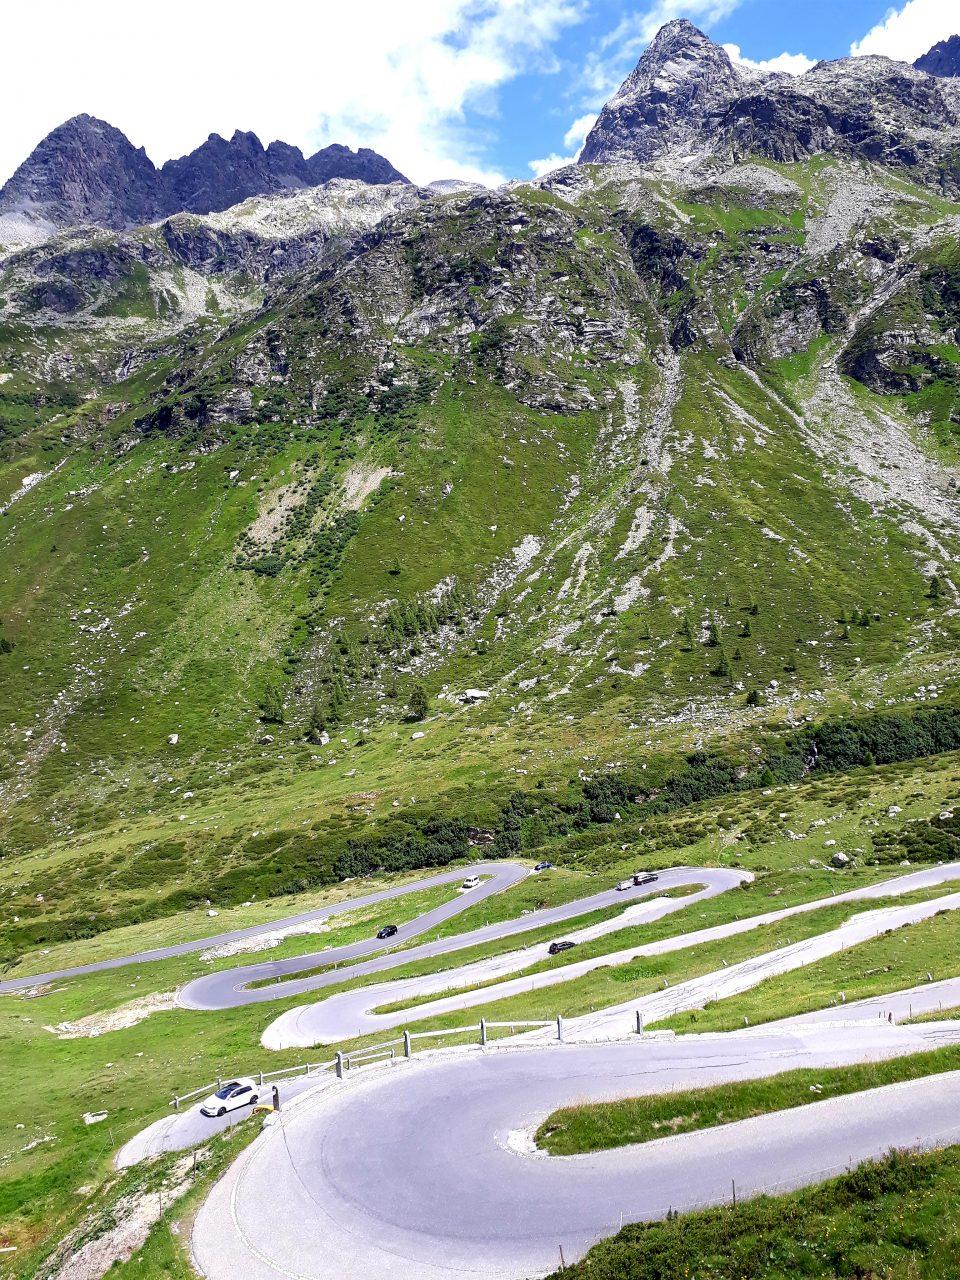 Giro dei passi svizzeri: Maloja, Julier e Spluga – 25/07/2020